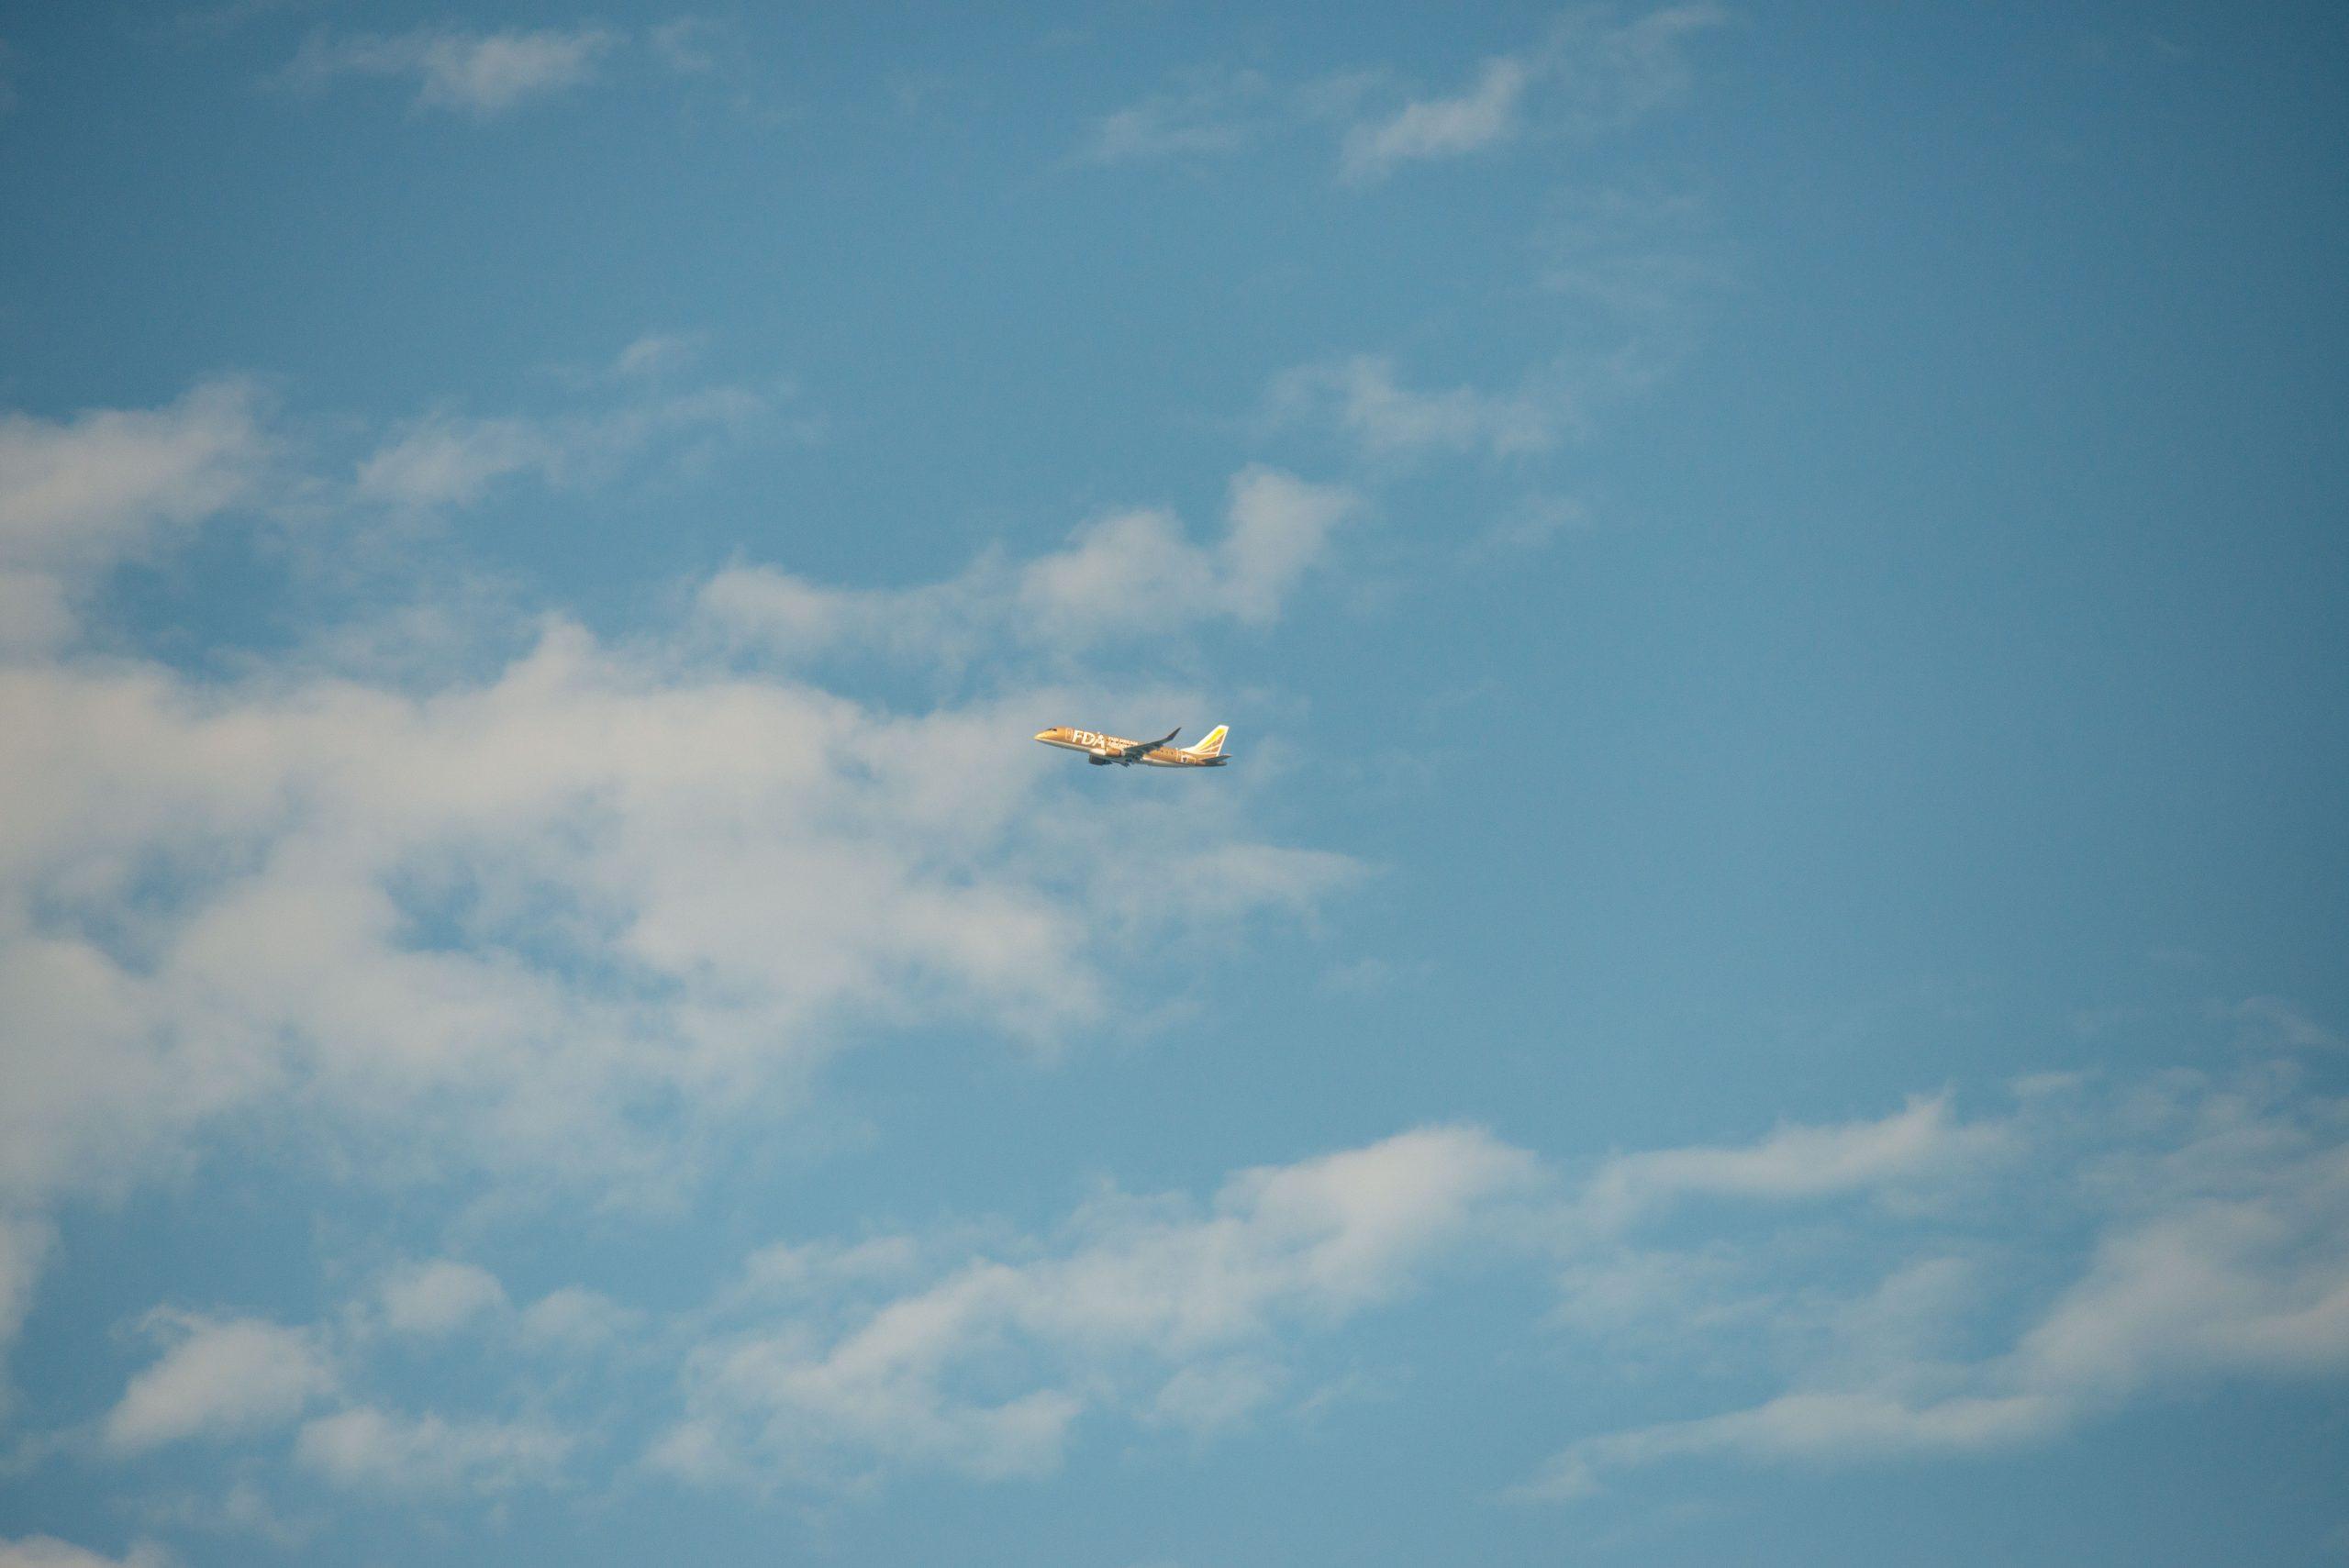 【Nikon】公園から飛行機を眺めて